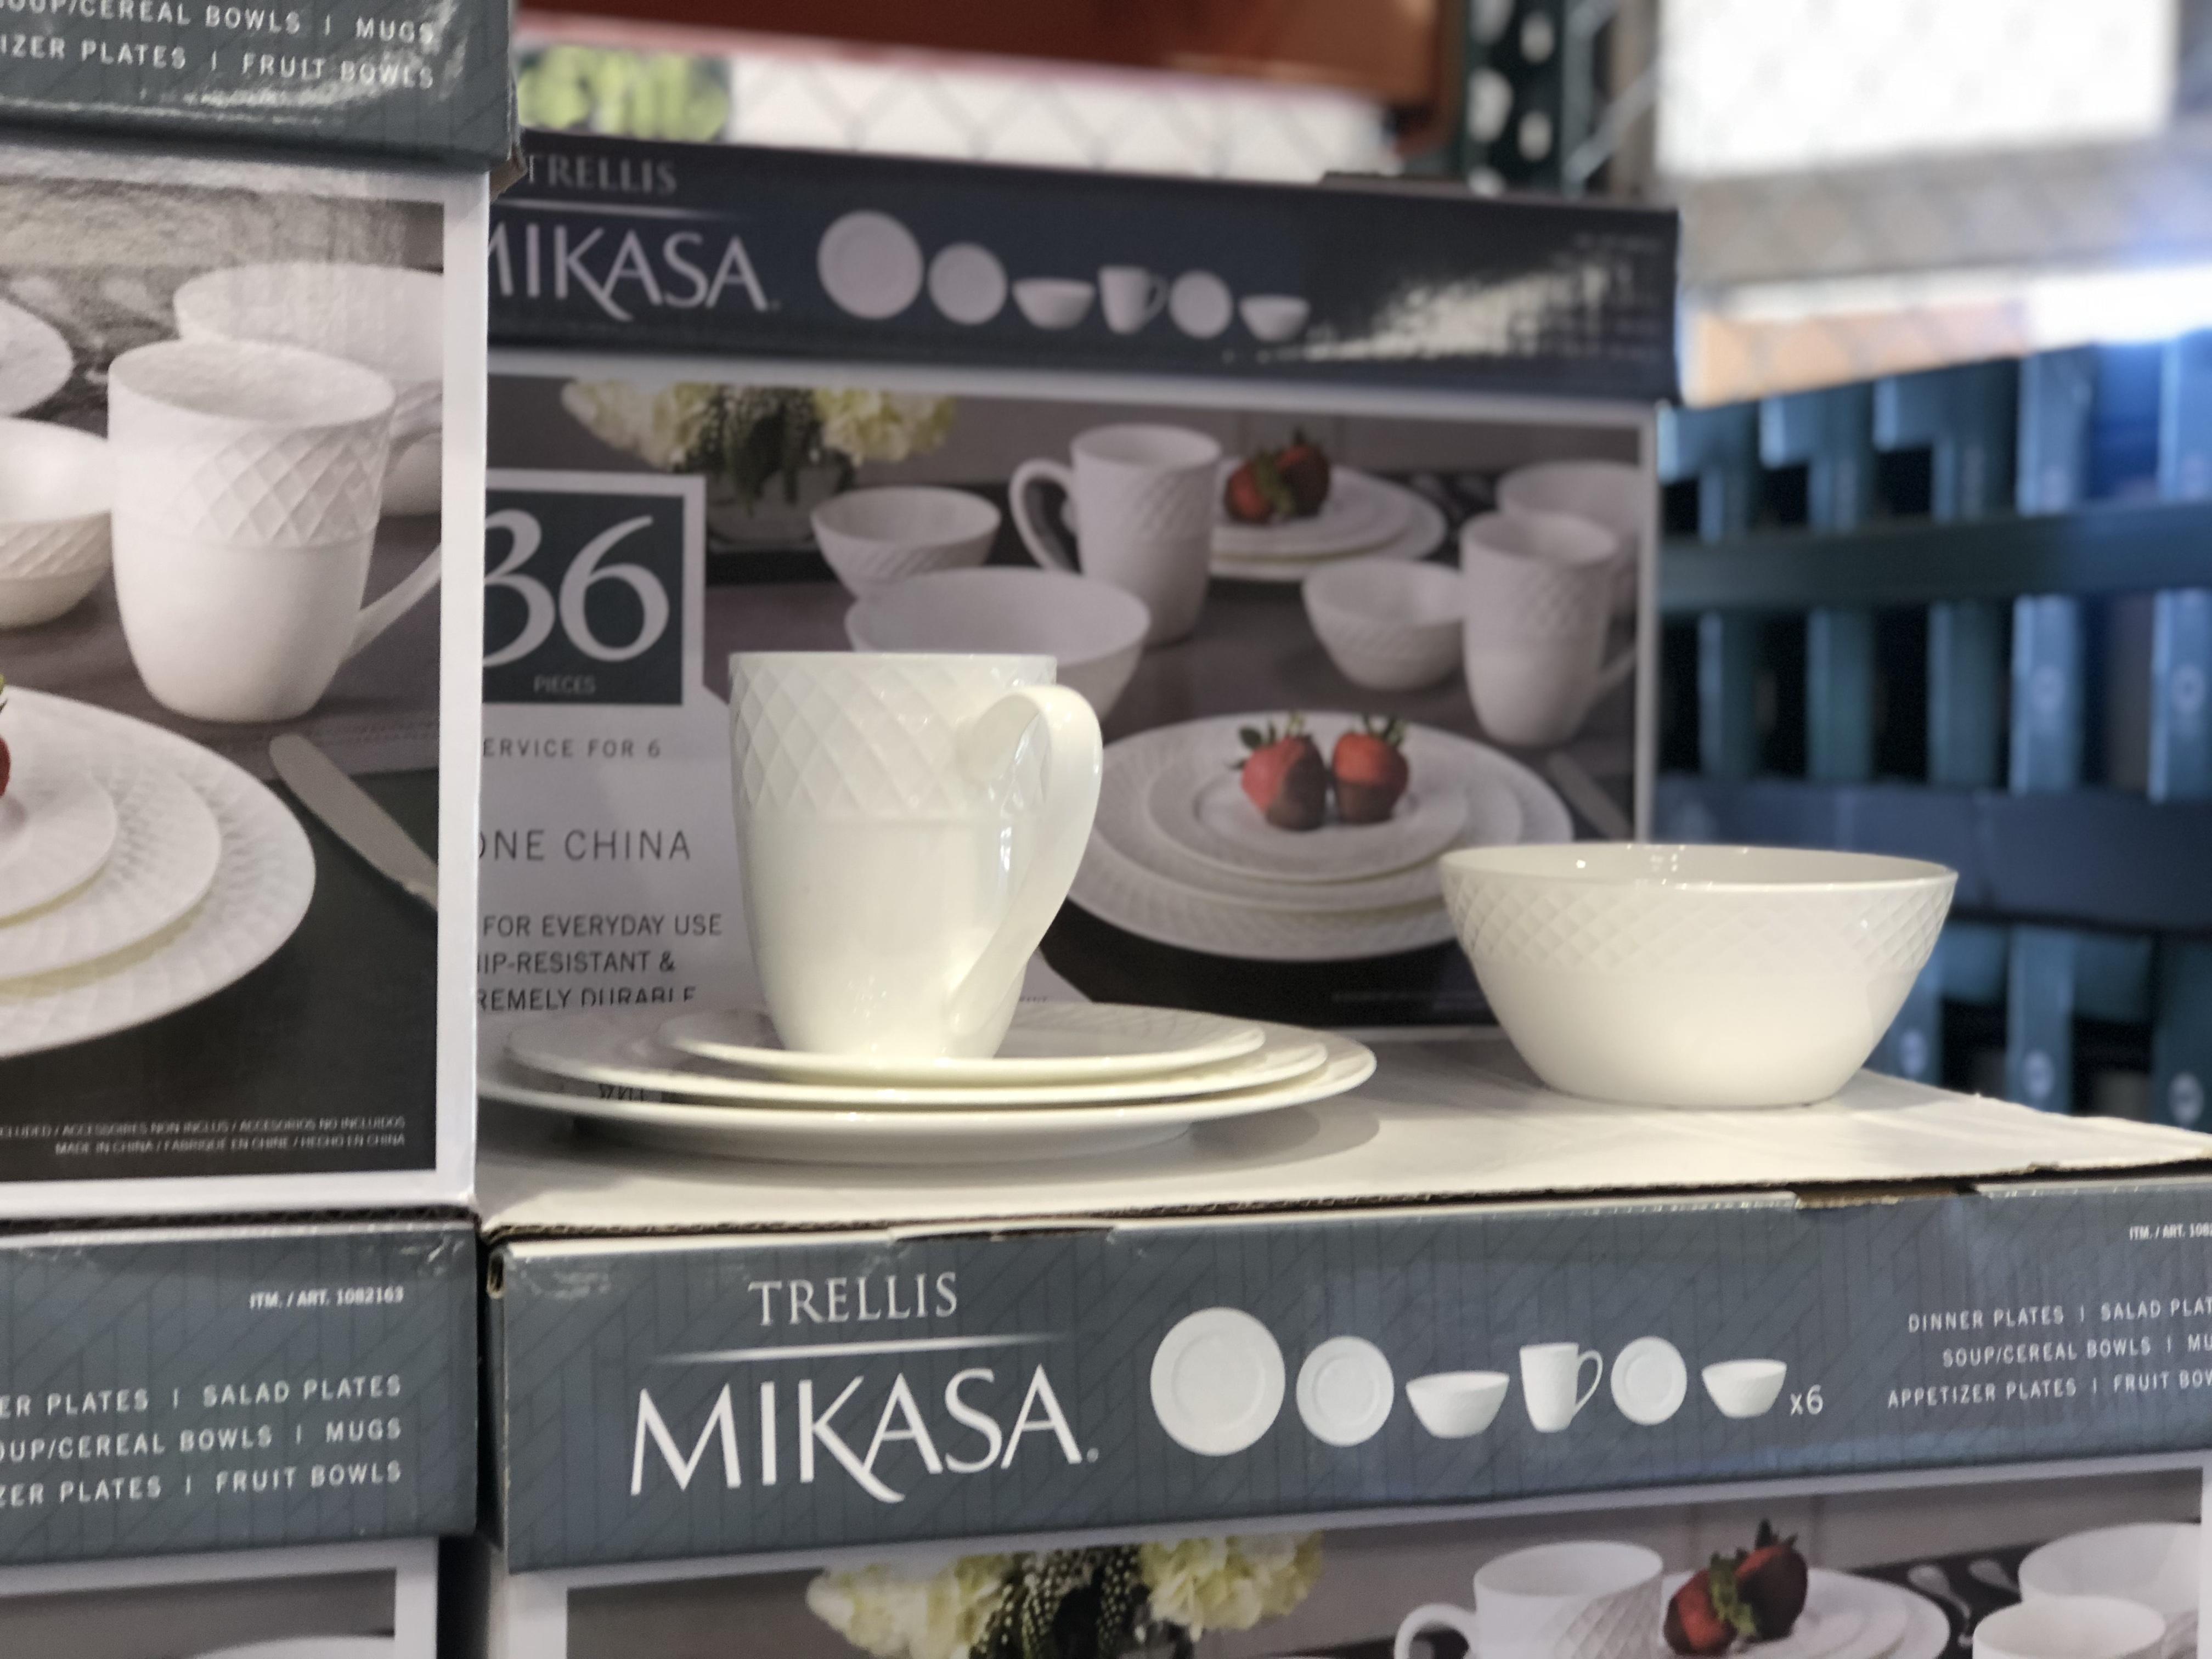 Costco deals October 2018 – Mikasa dinnerware at Costco